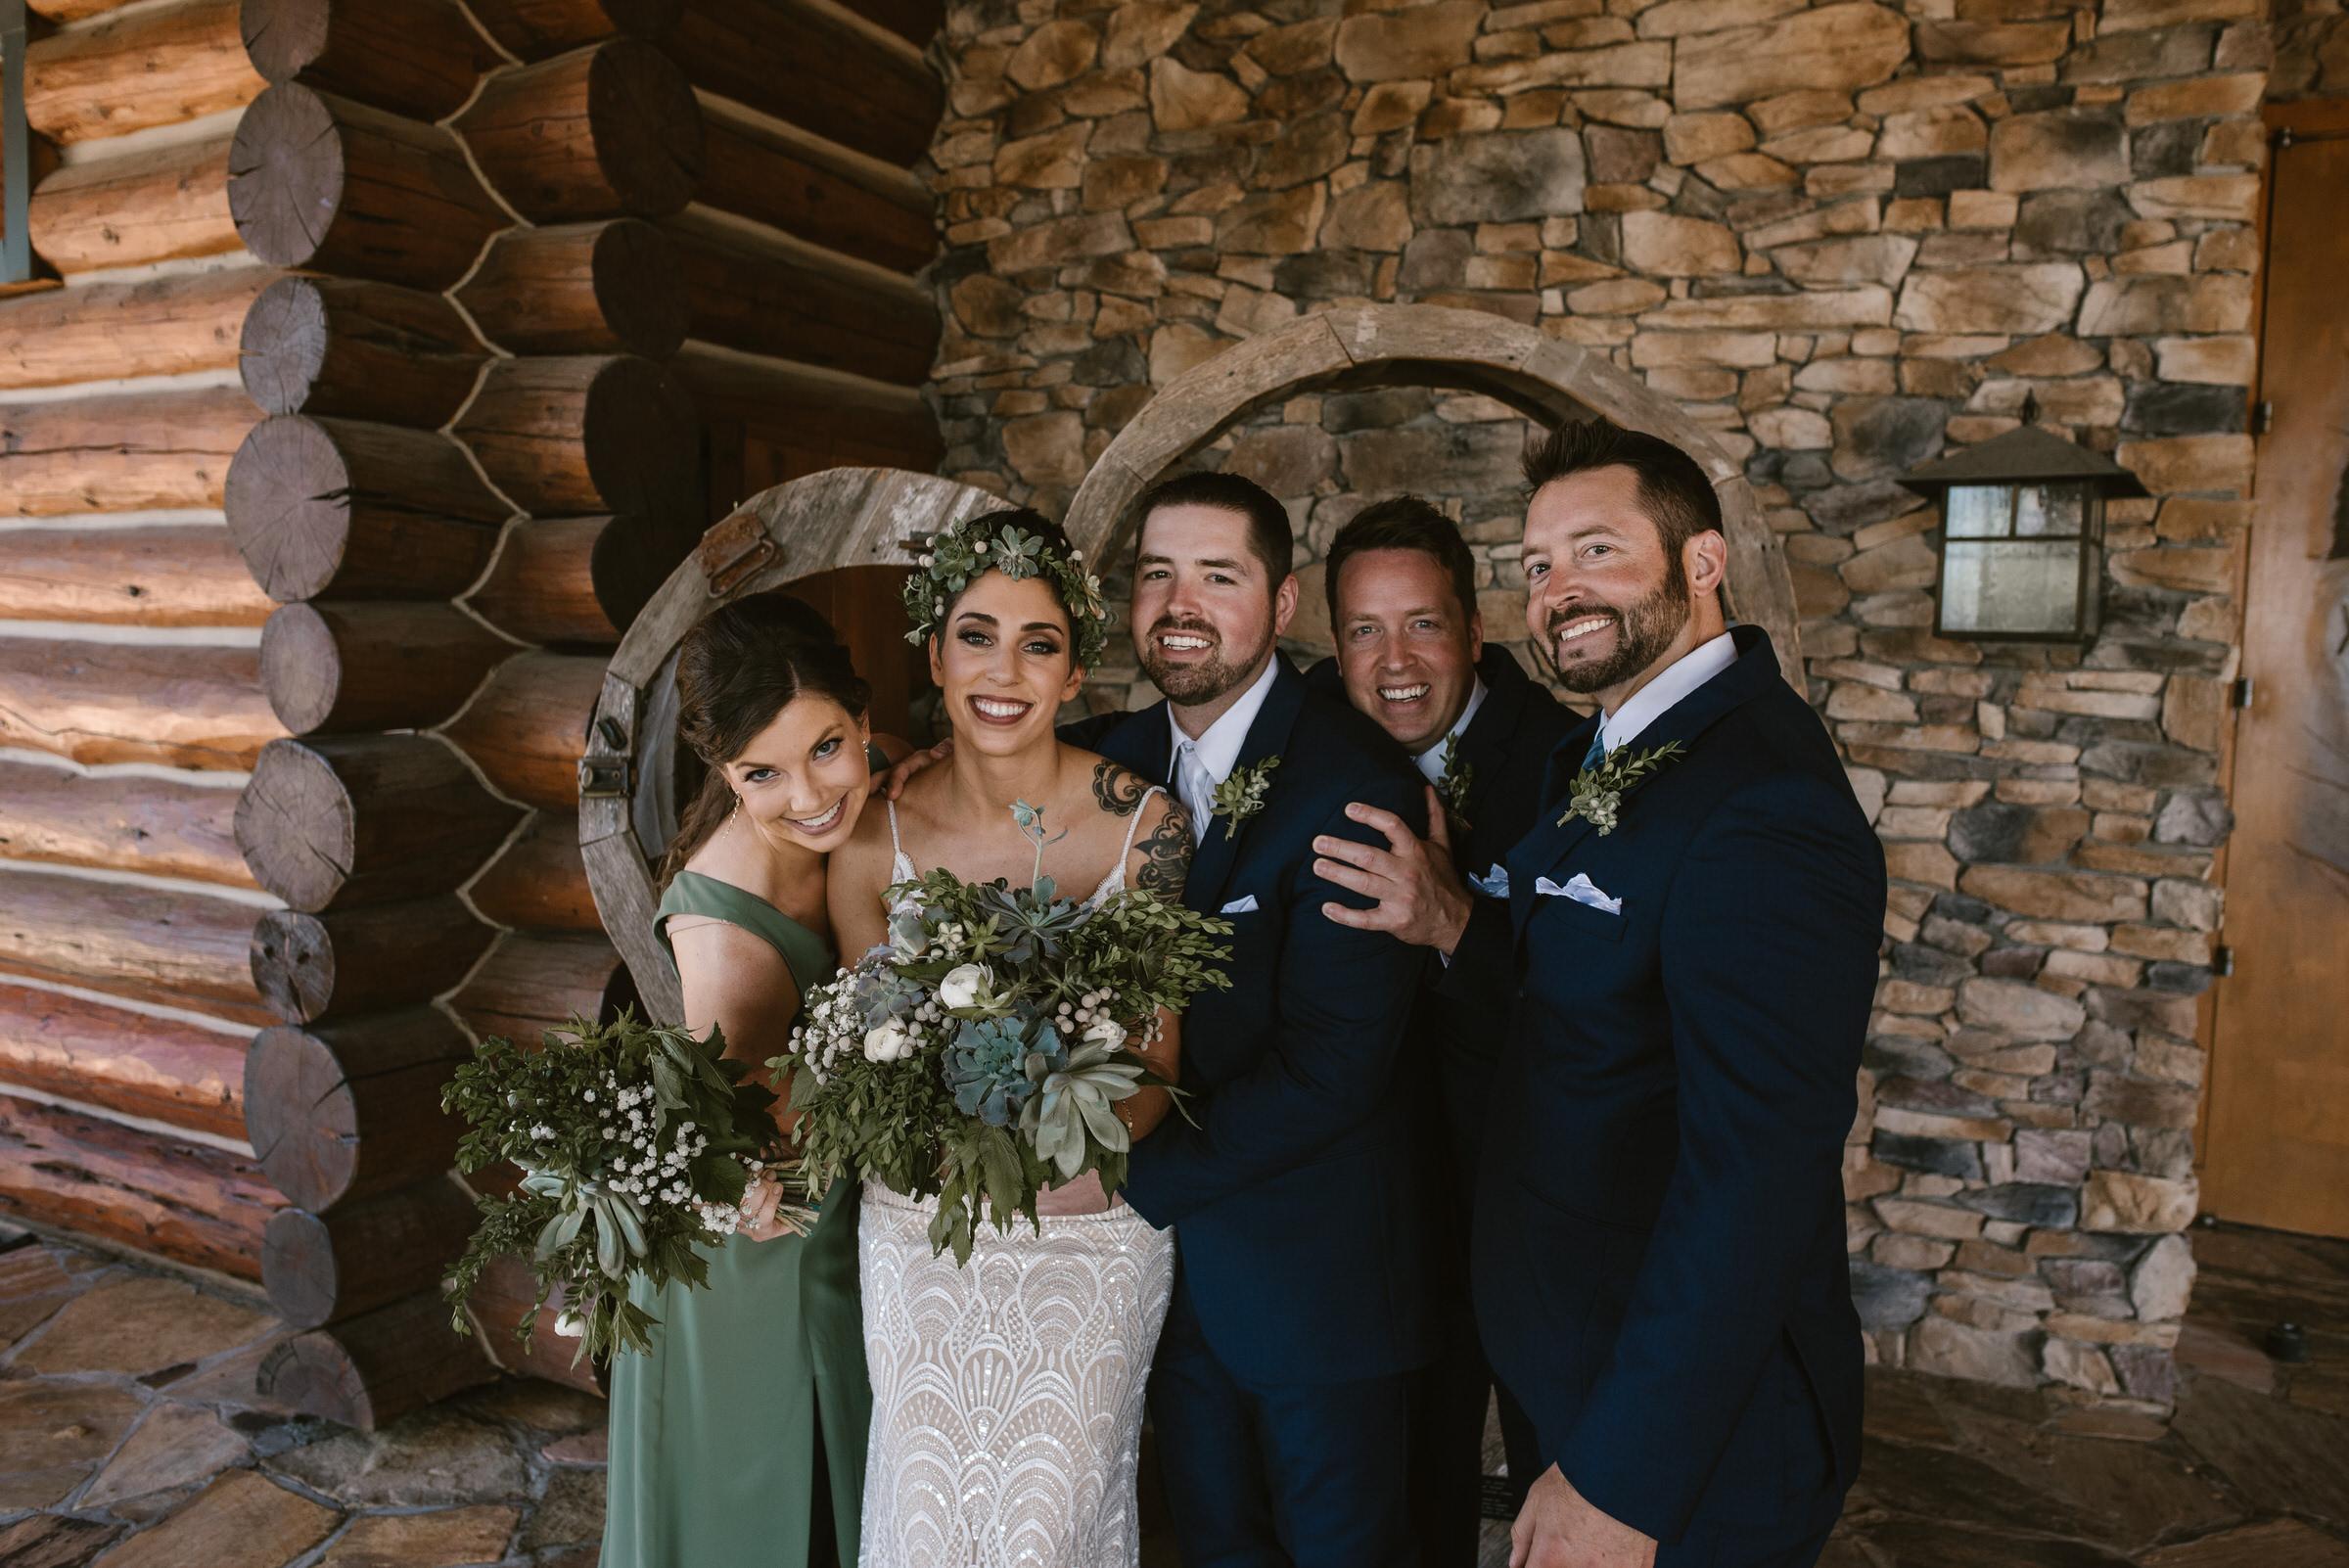 Wilderness-Ridge-Lincoln-Nebraska-Wedding-Kaylie-Sirek-Photography-041.jpg